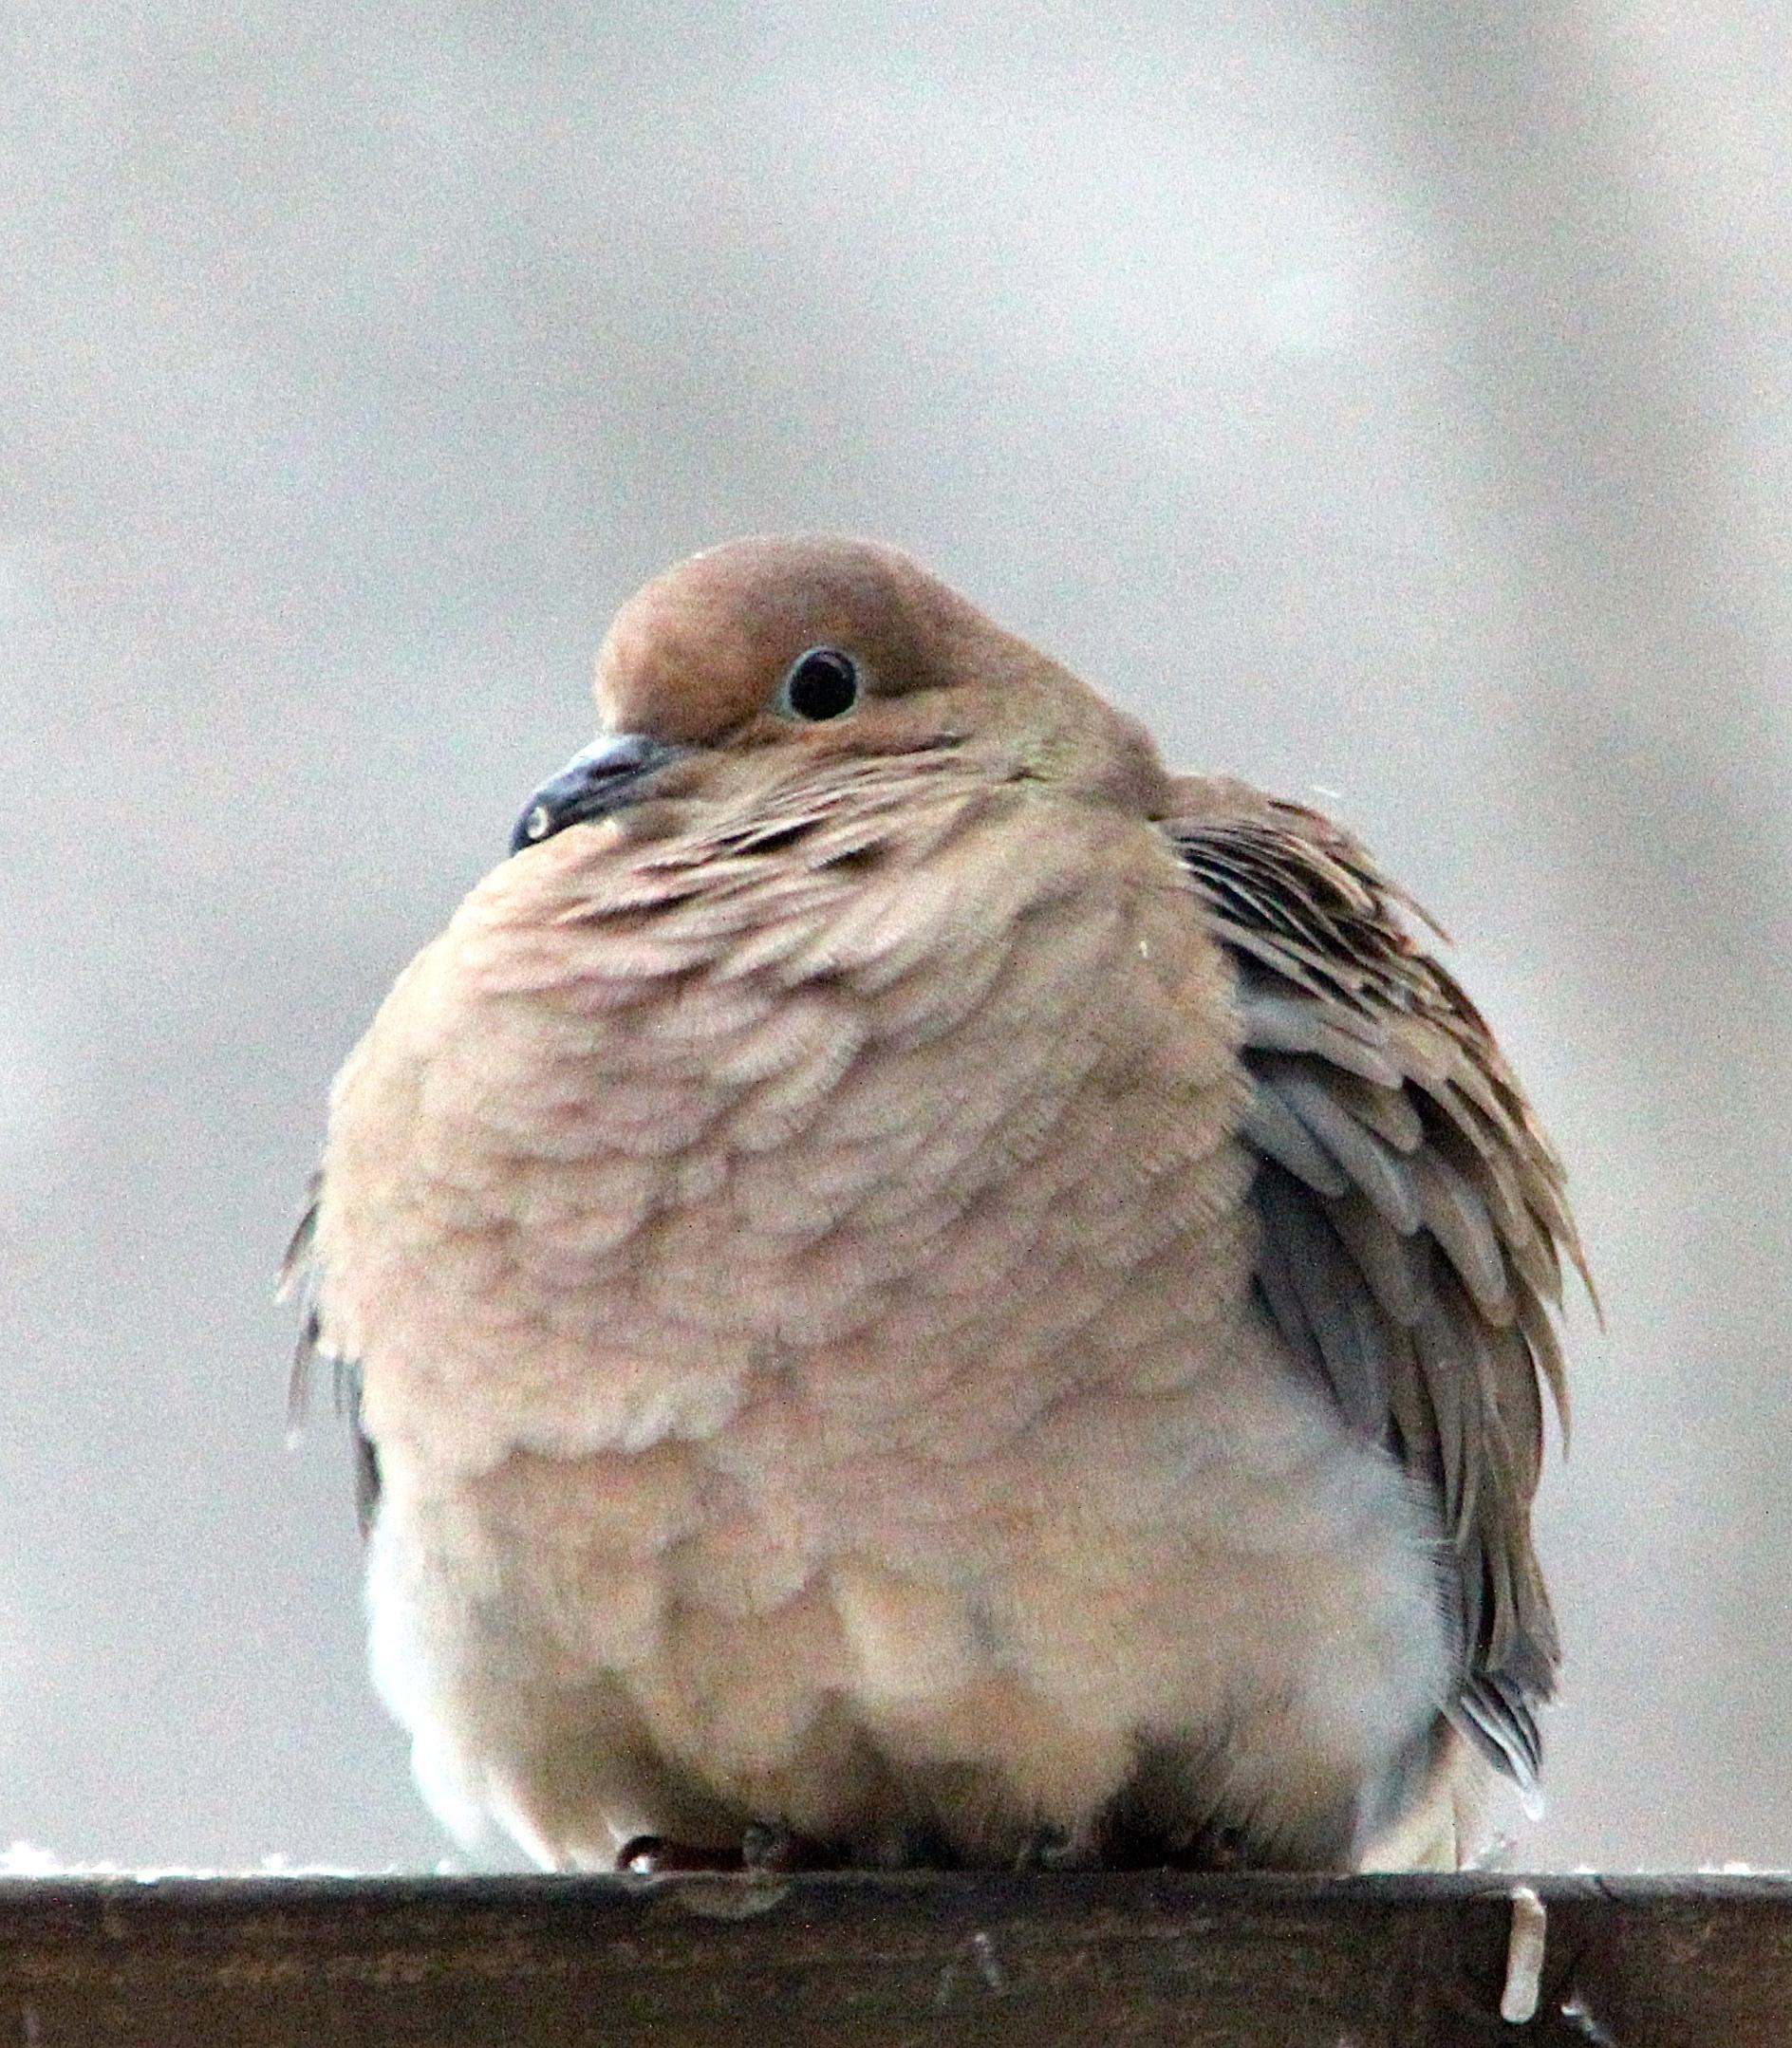 Pigeon Fluffed up